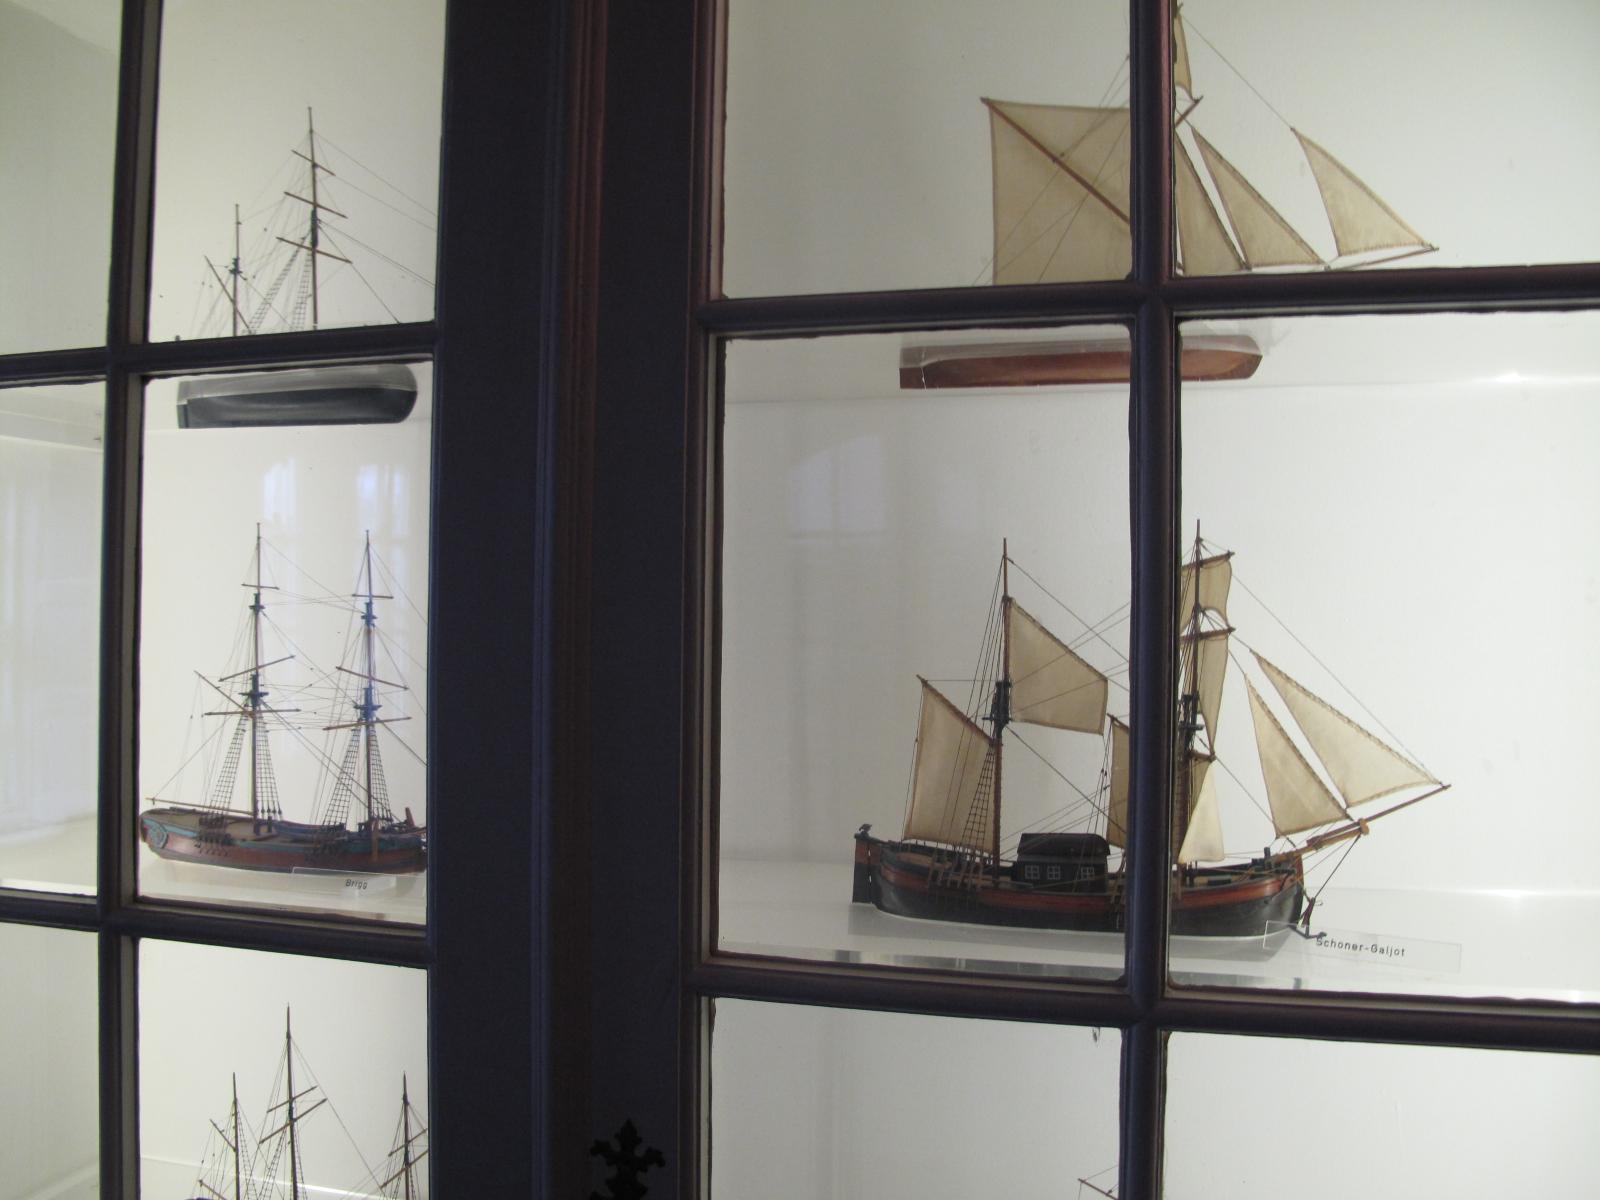 Modellschiffe